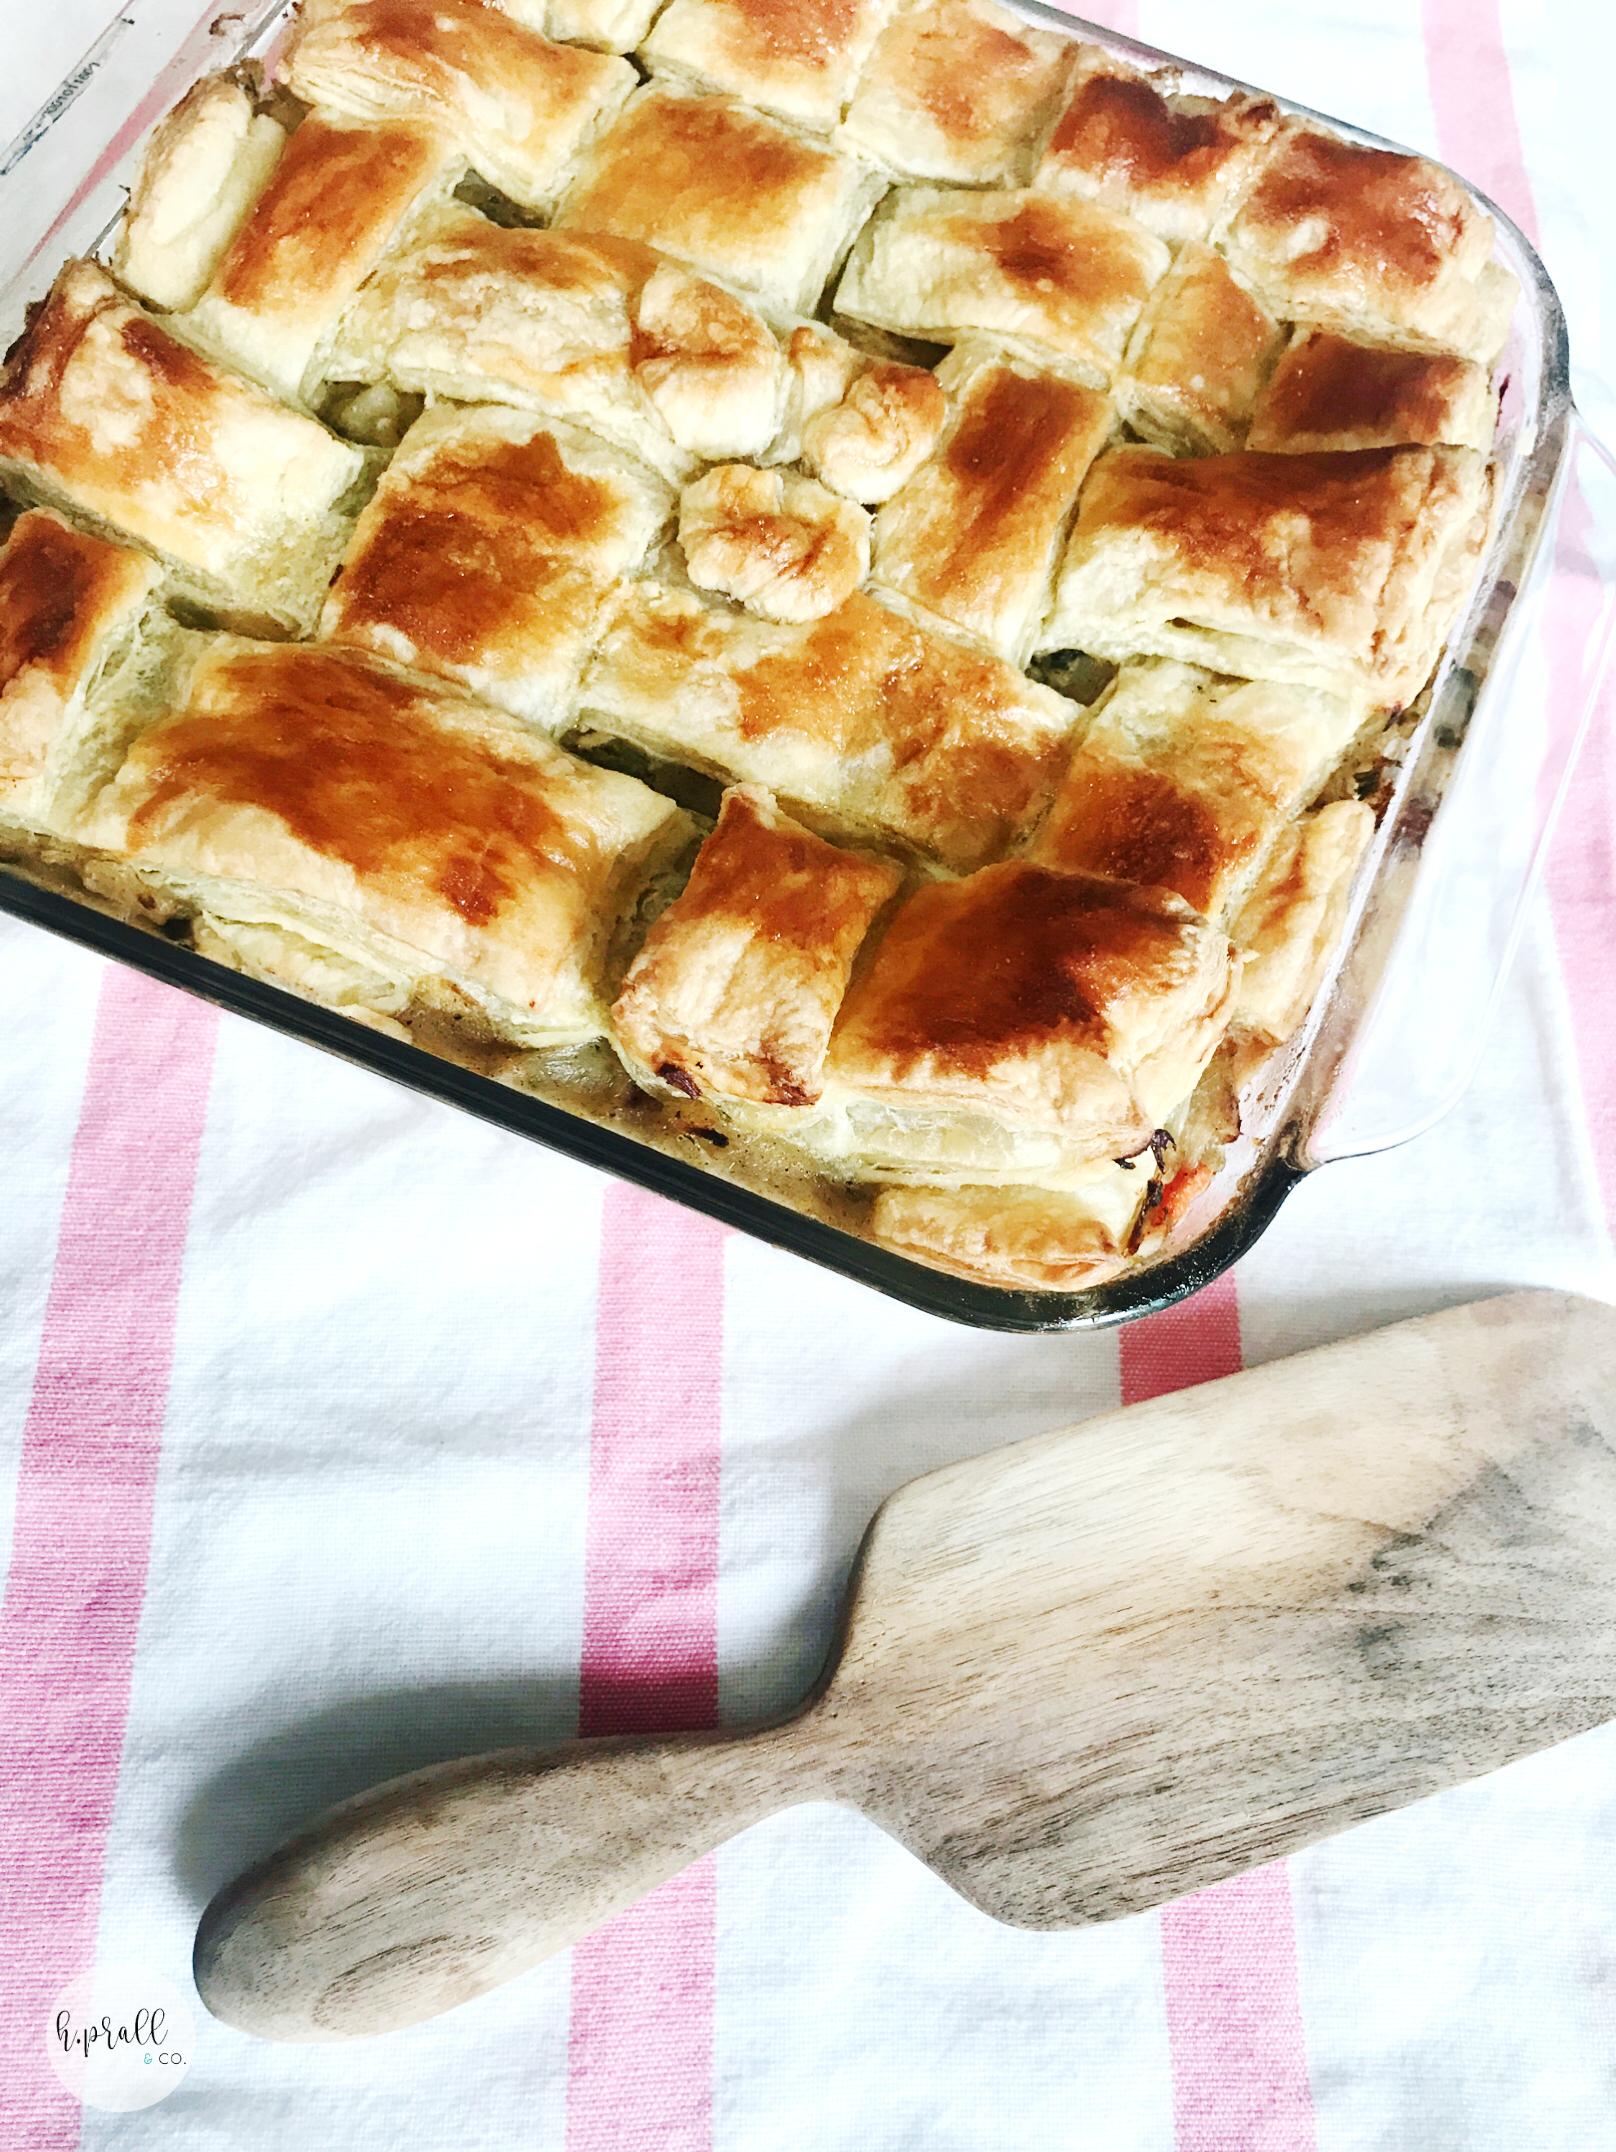 Turkey Pot Pie Recipe from H.Prall & Co.